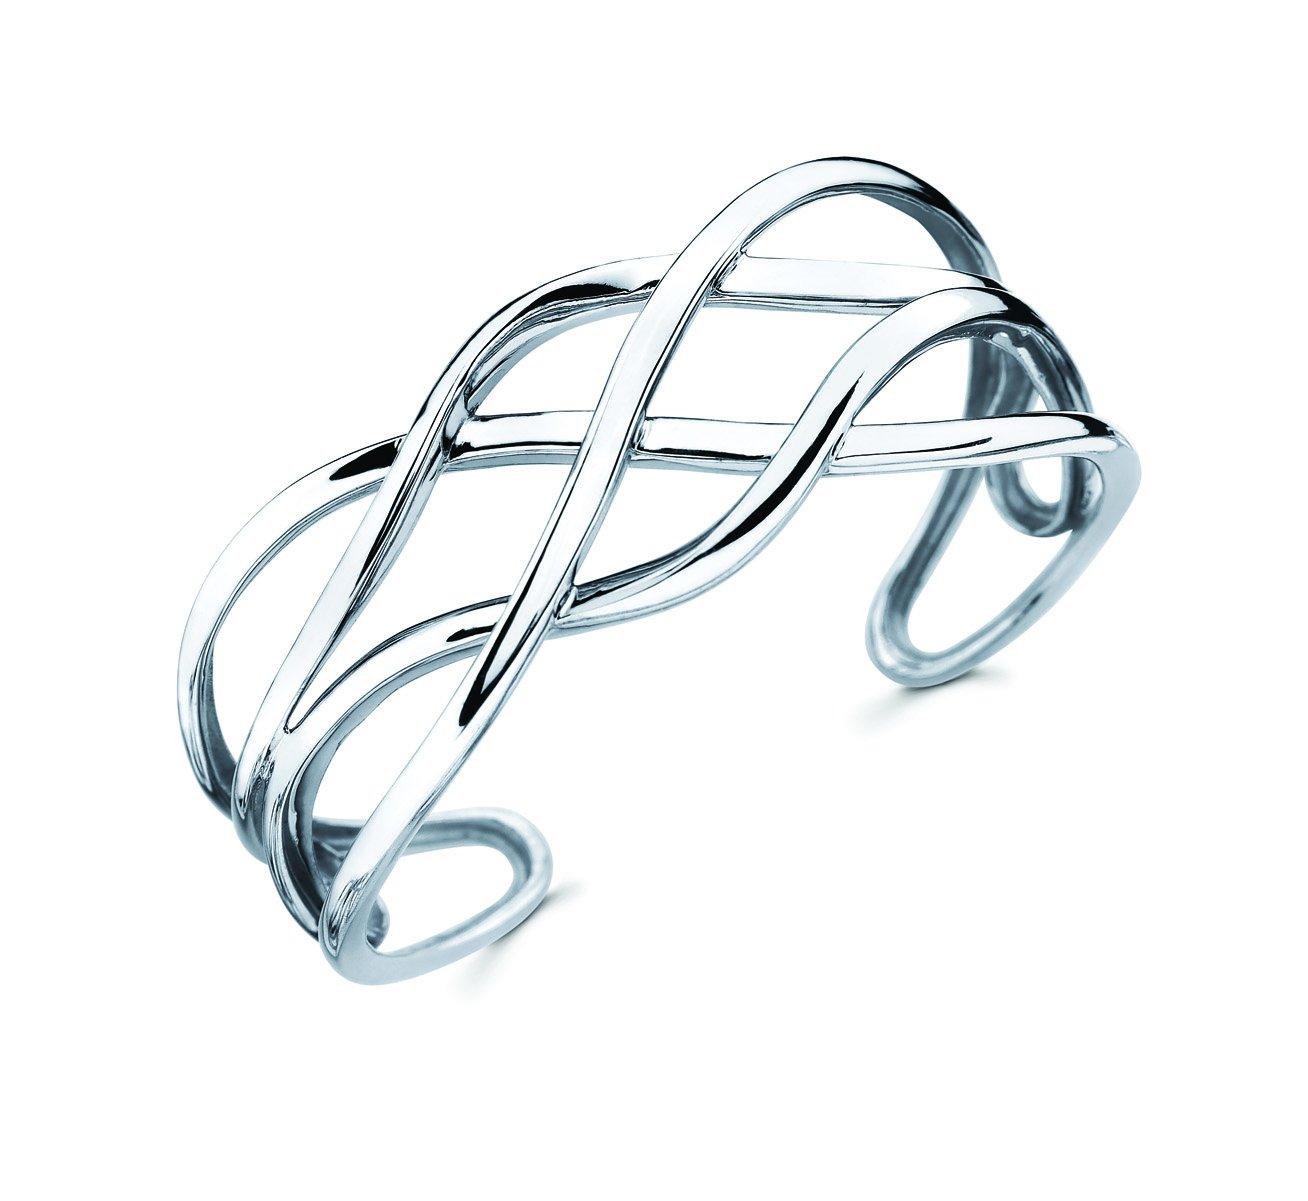 Sterling Silver Fashion Cuff Bracelet (fits 7'' wrist)